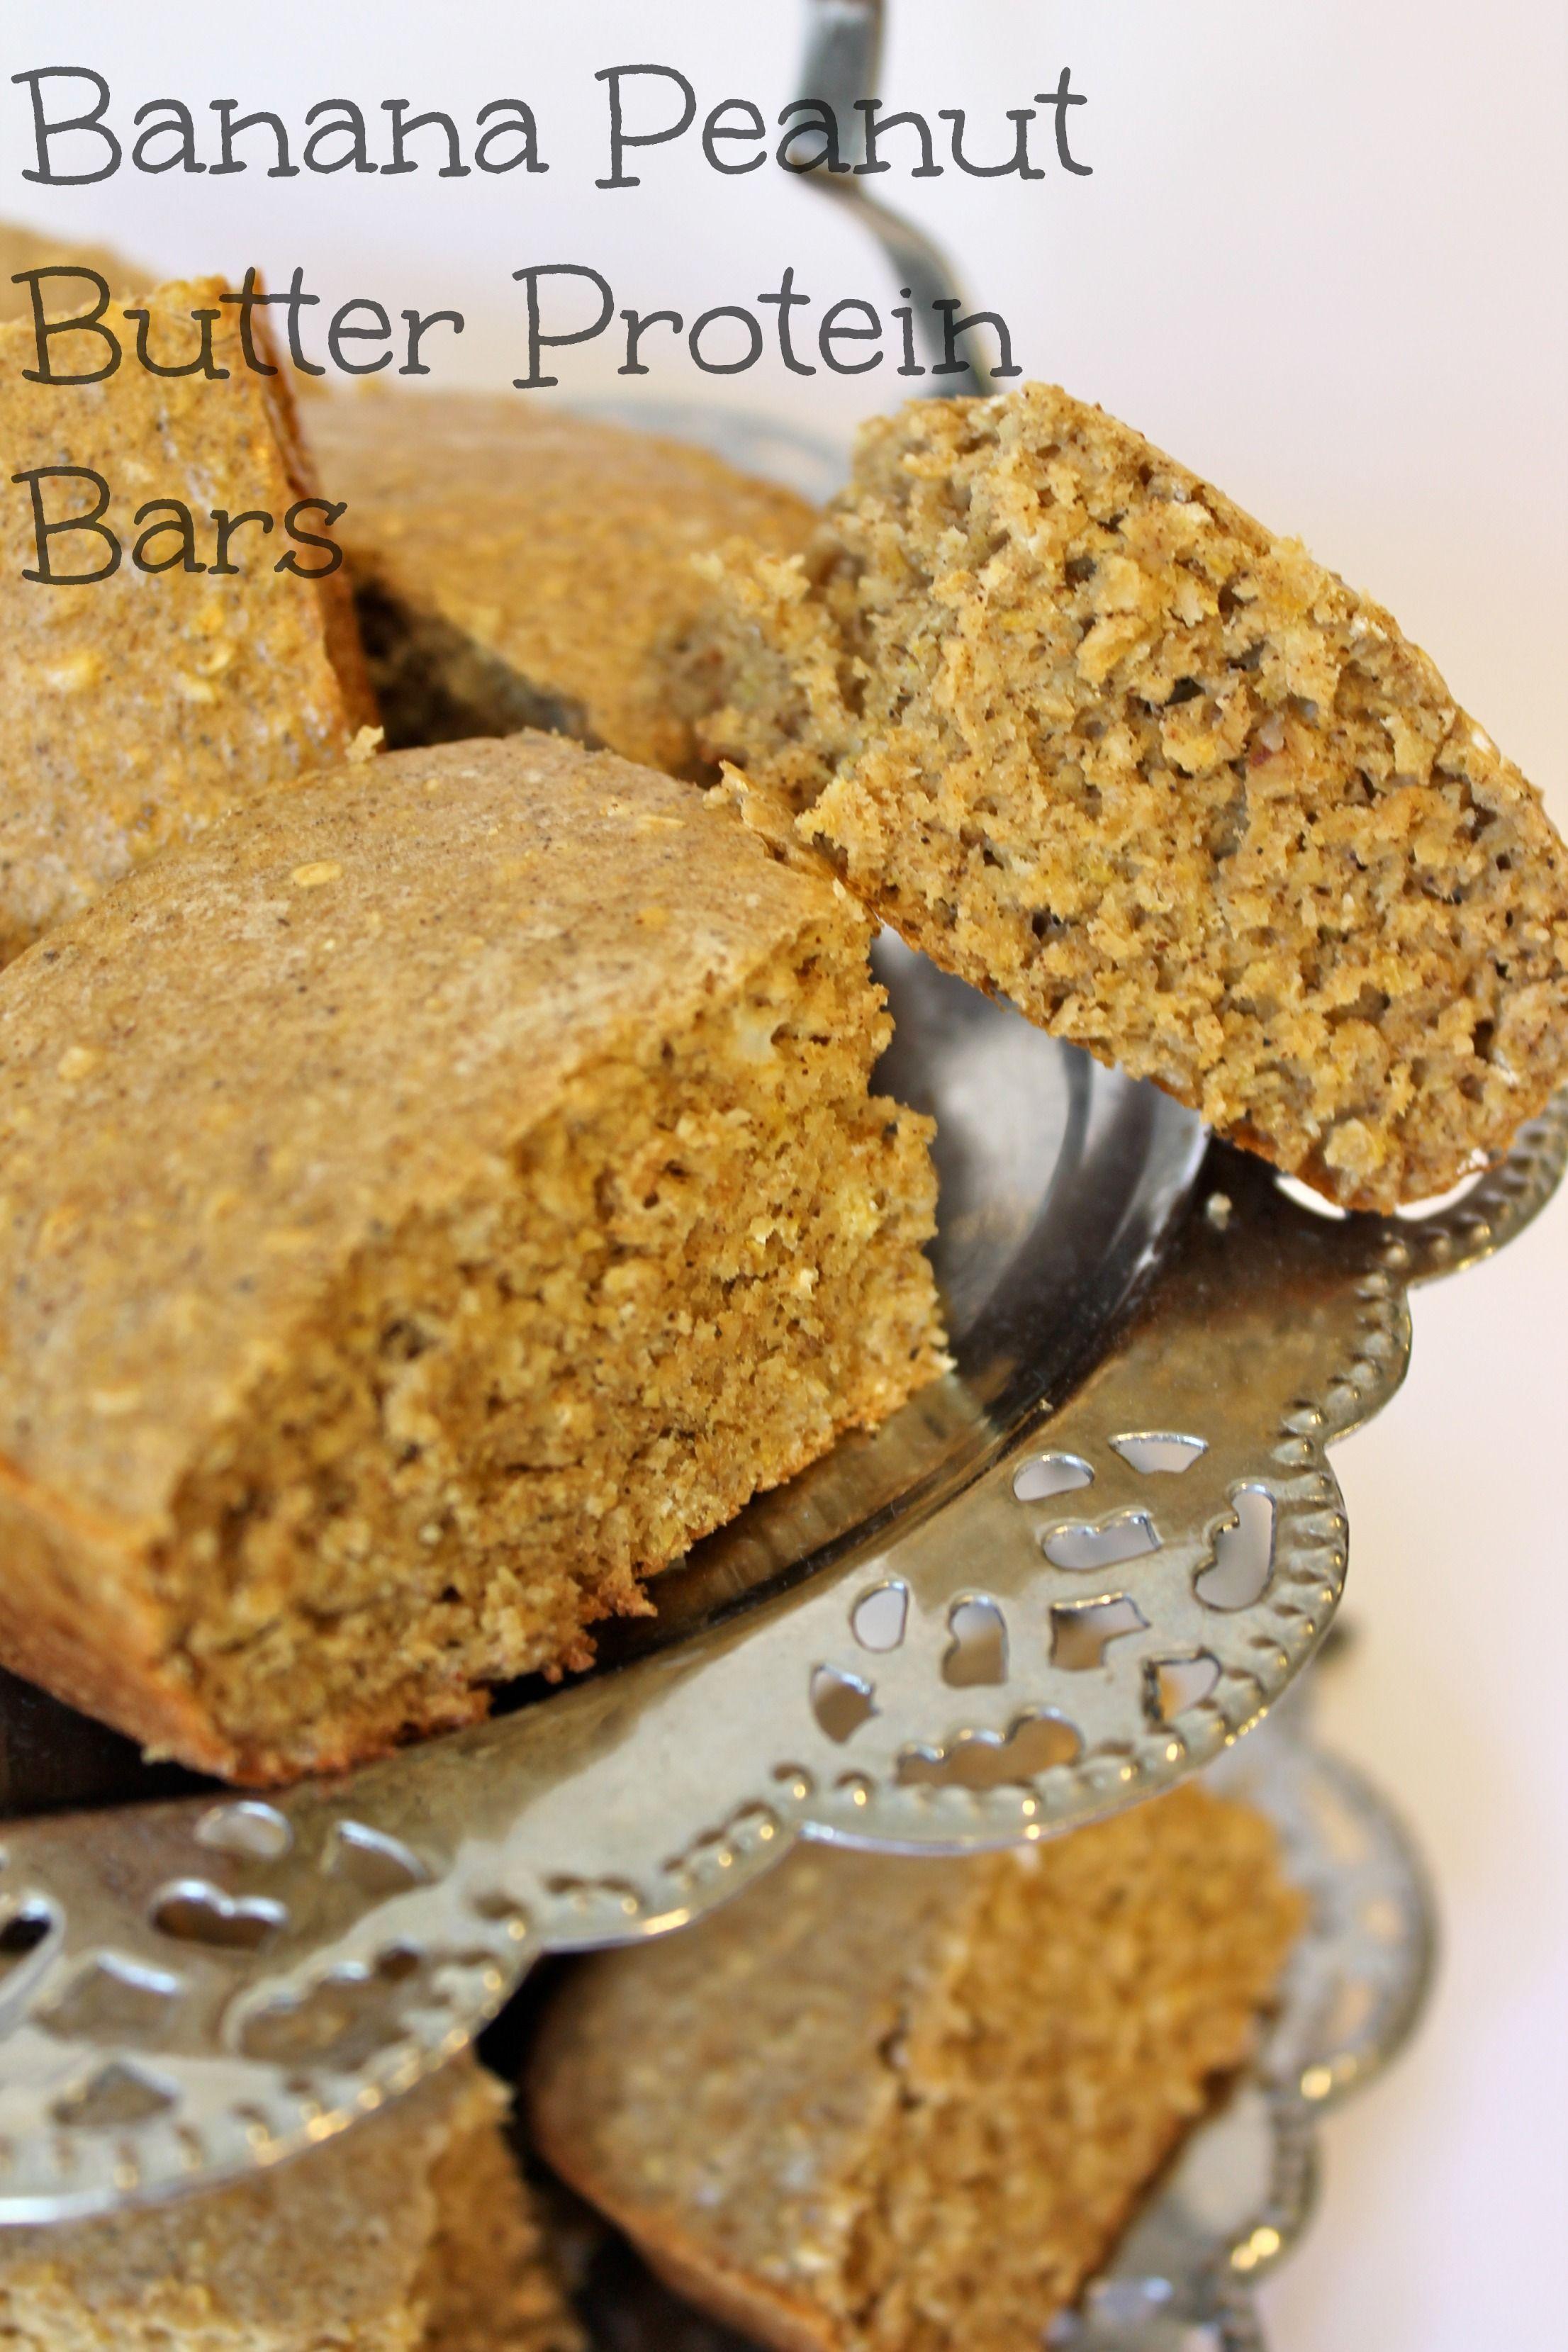 Banana Peanut Butter Protein Bars Super Healthy Like 100 Calories Sq Chunky Bar White Gr Per Serving Low Sugar Carbs